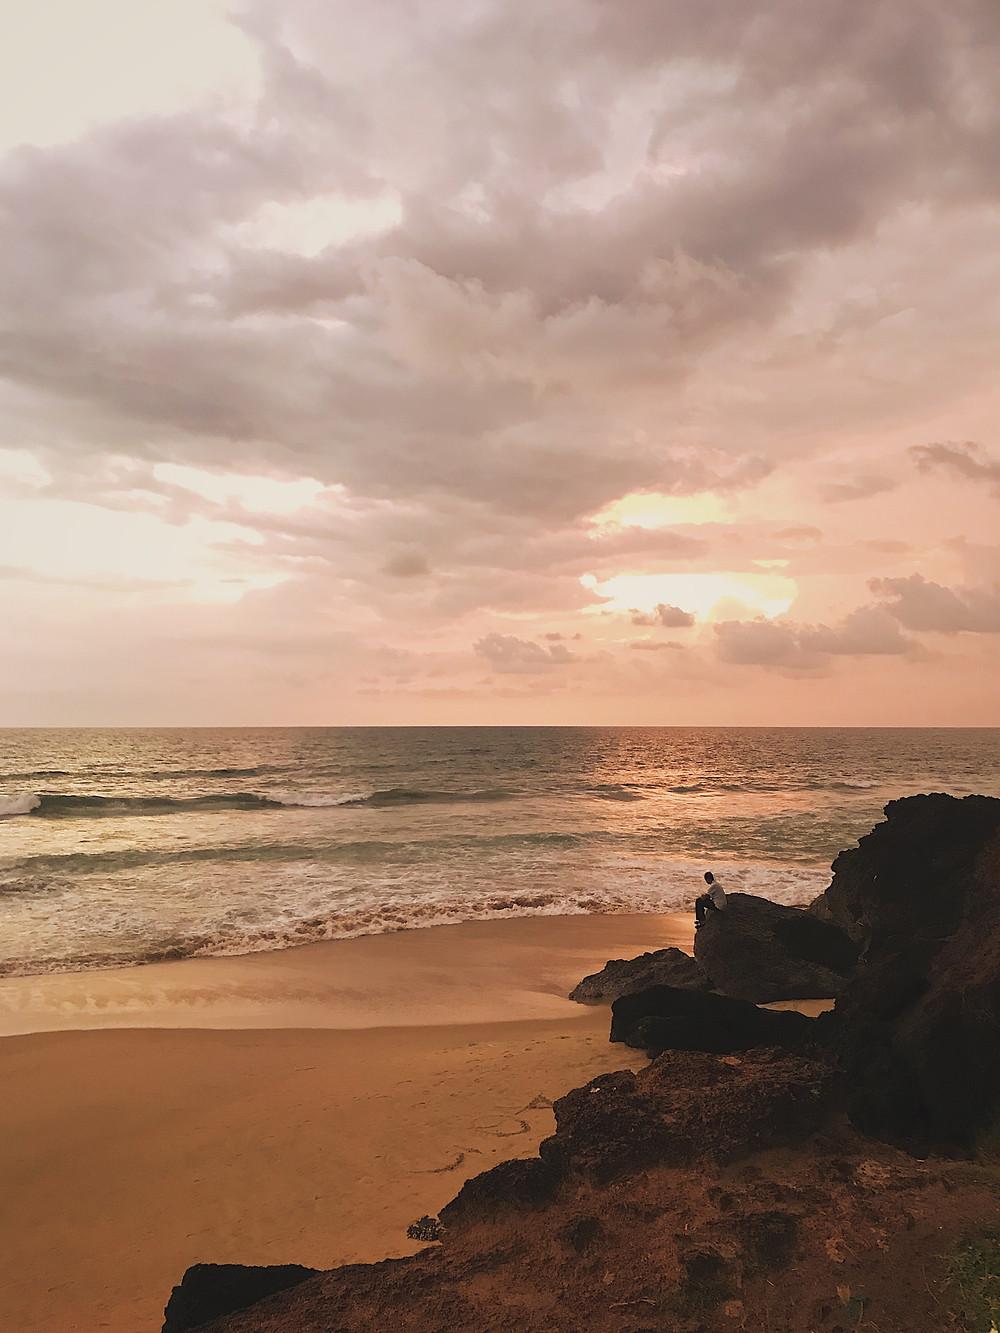 Sunset view at Varkala Beach, Kerala, India